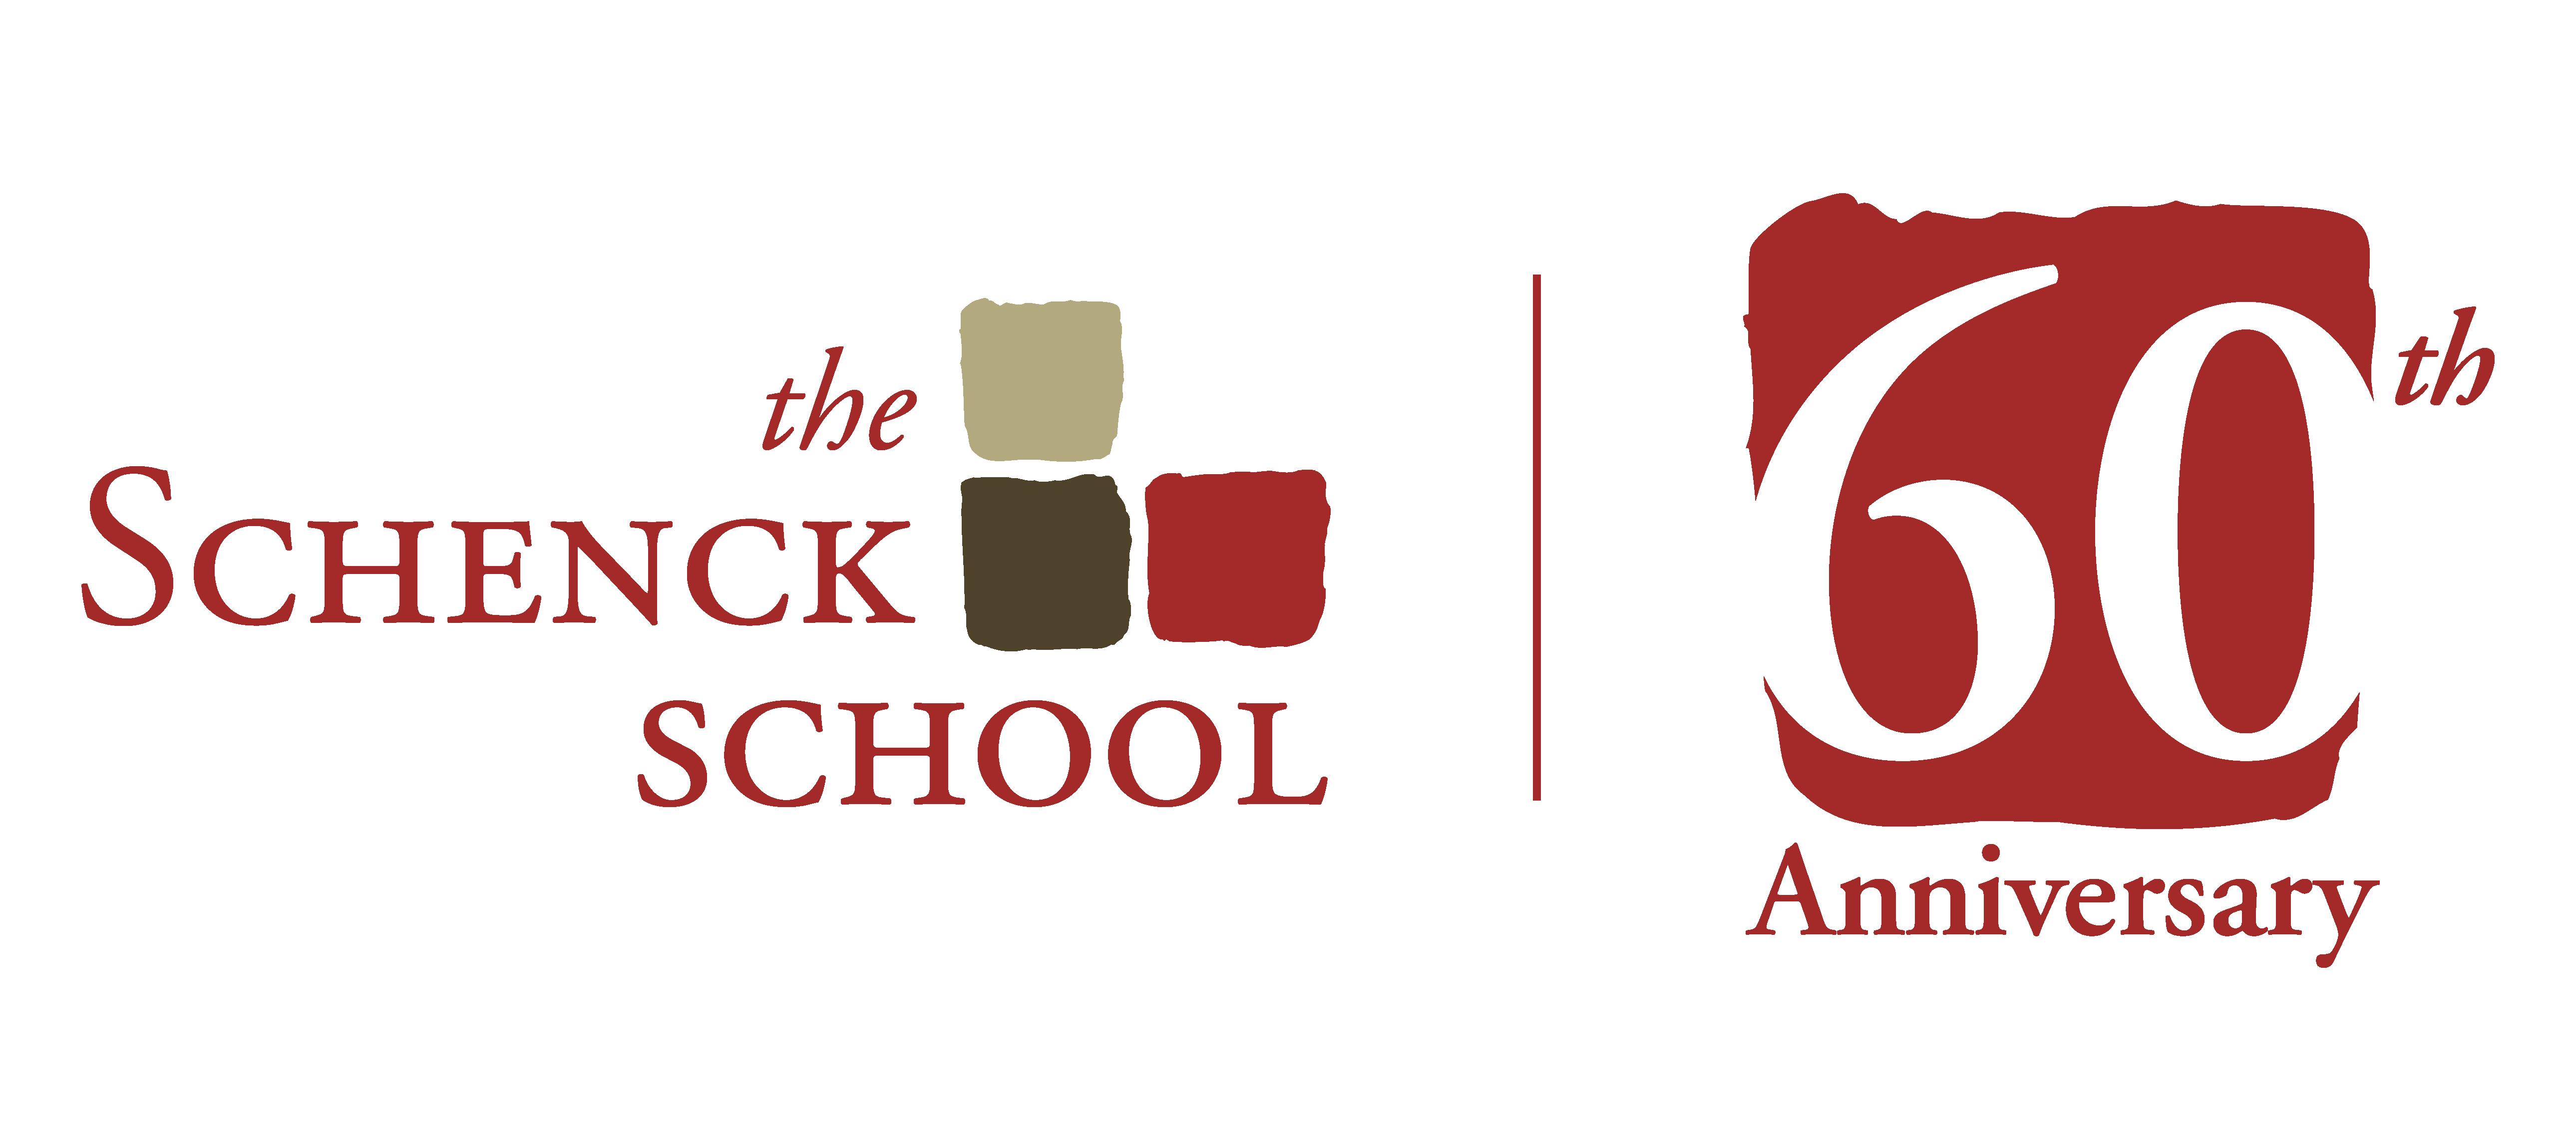 The Schenck School, Inc. Company Logo